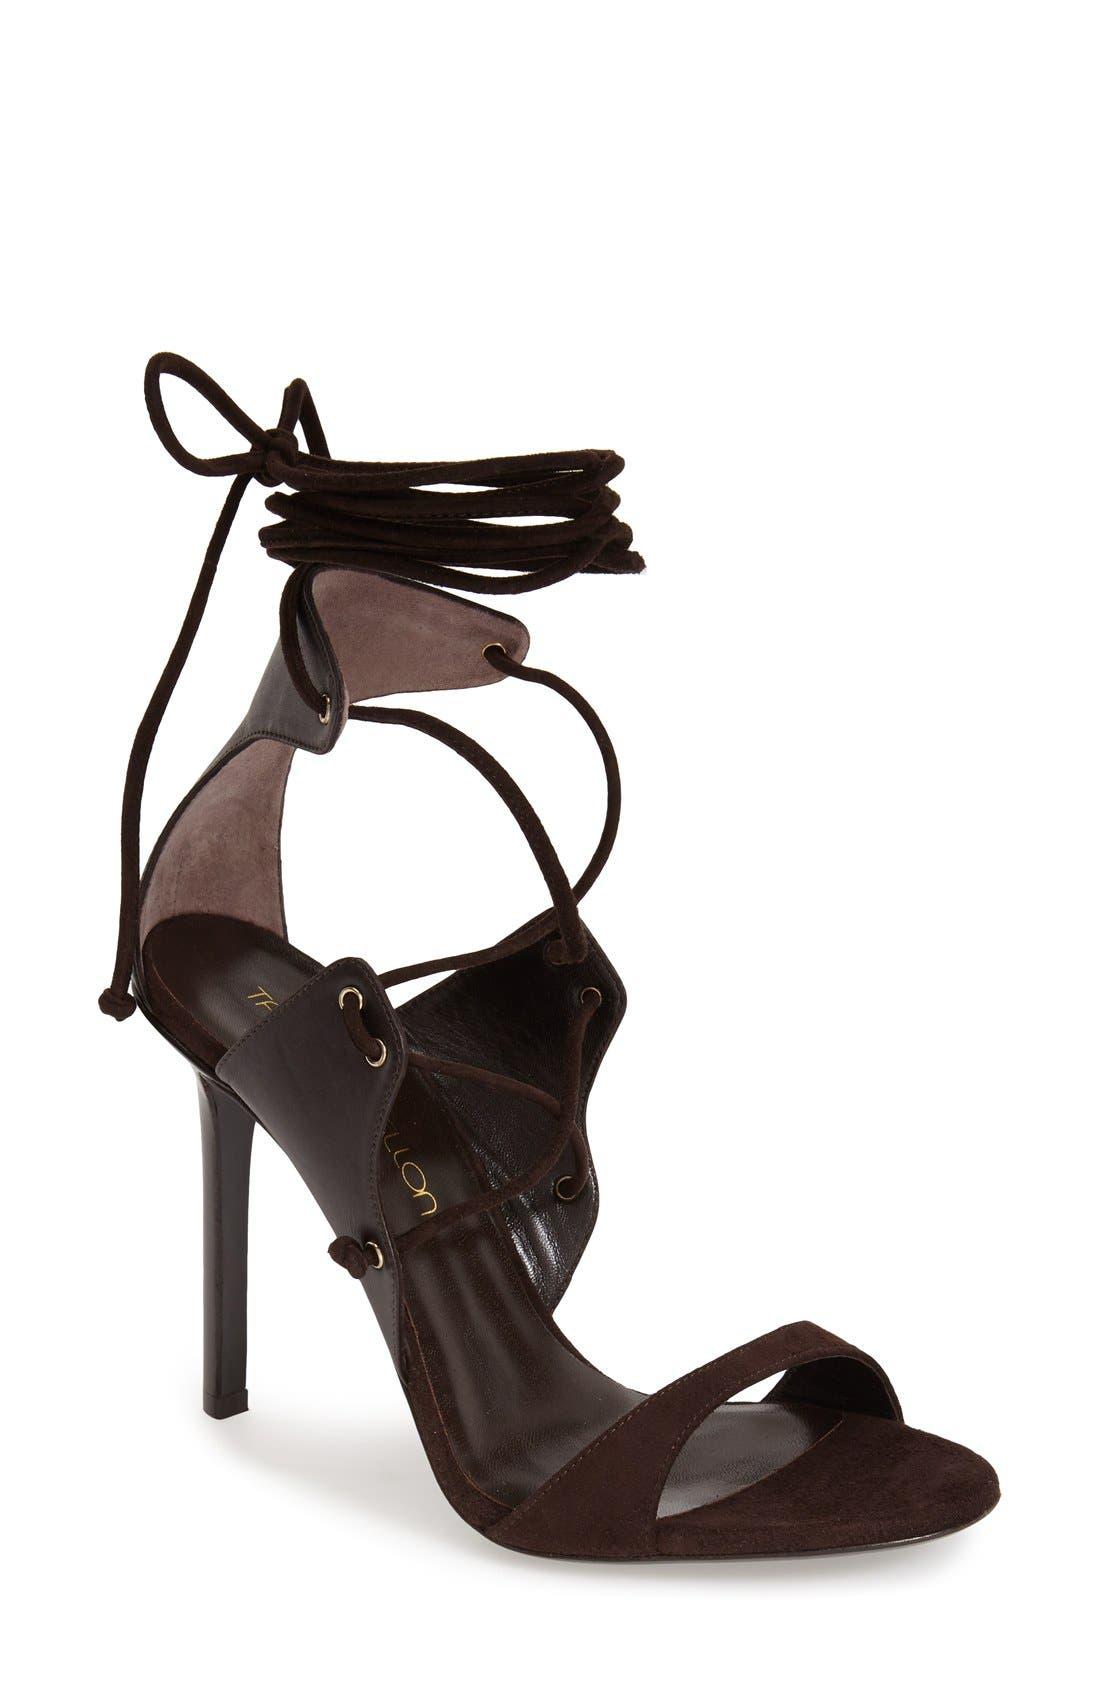 Main Image - Tamara Mellon 'Gladiatrix' Lace-Up Sandal (Women)